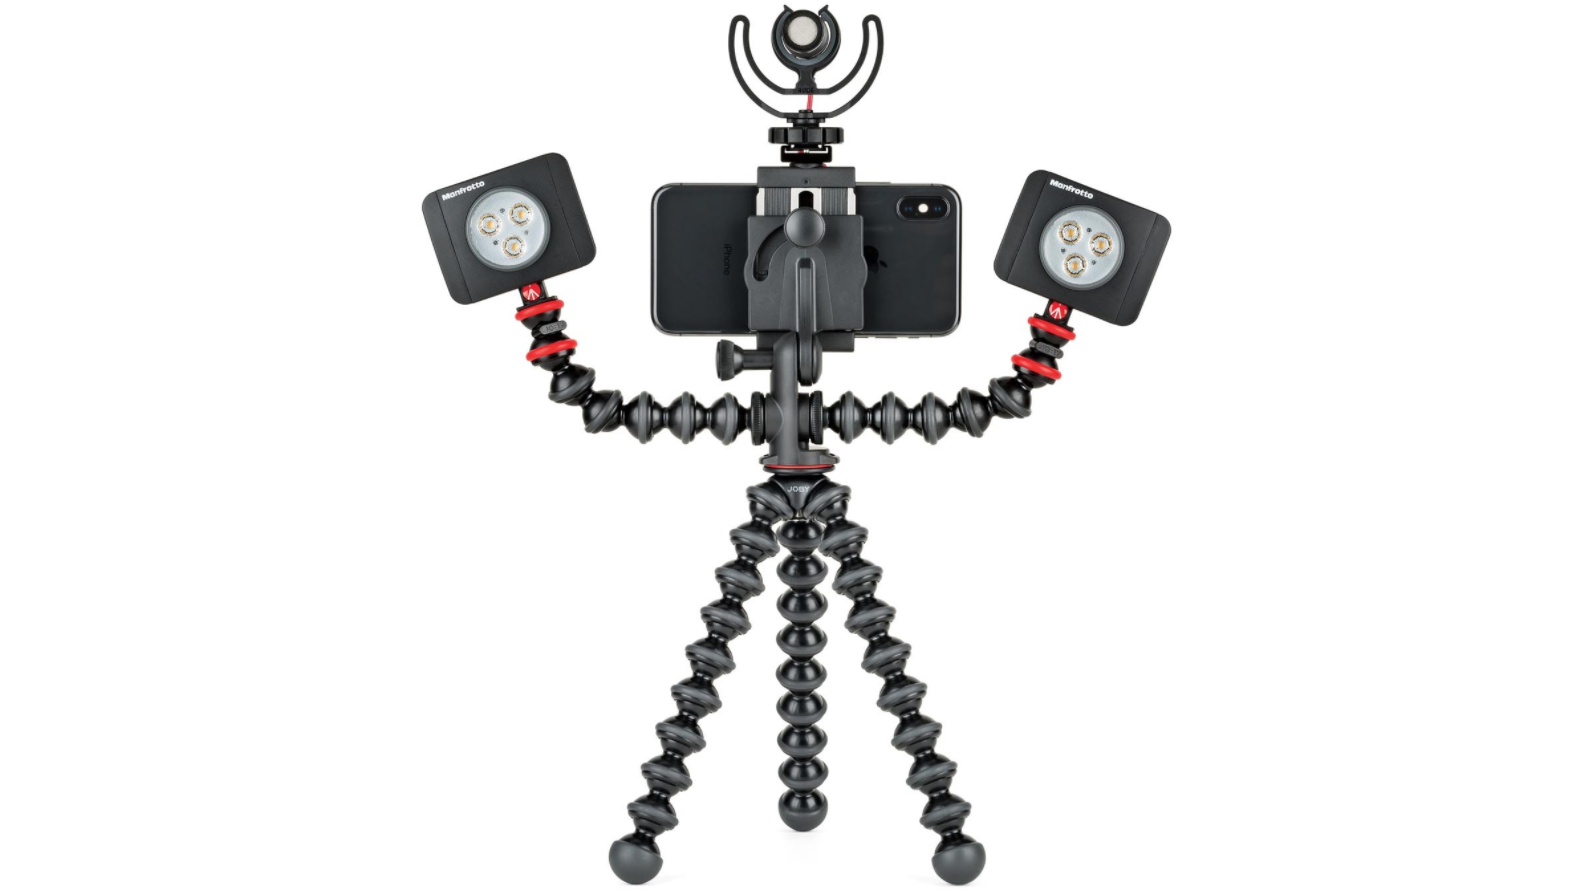 Best smartphone tripods: Joby GorillaPod Mobile Rig